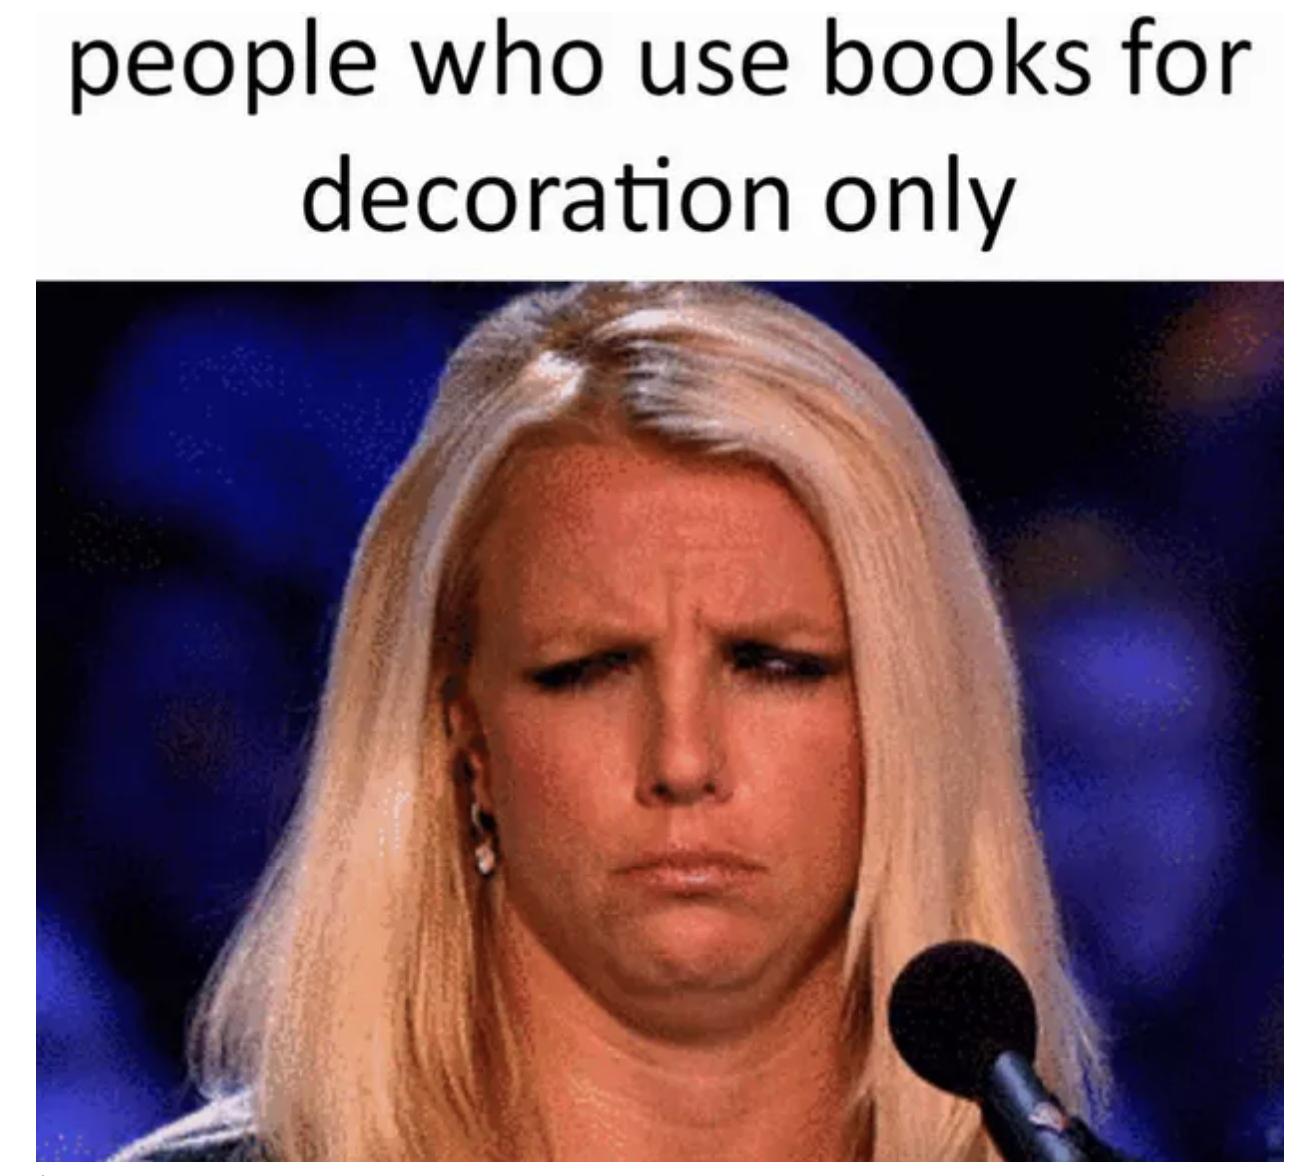 book memes, reading memes, memes about books, memes about reading, book meme, reading meme